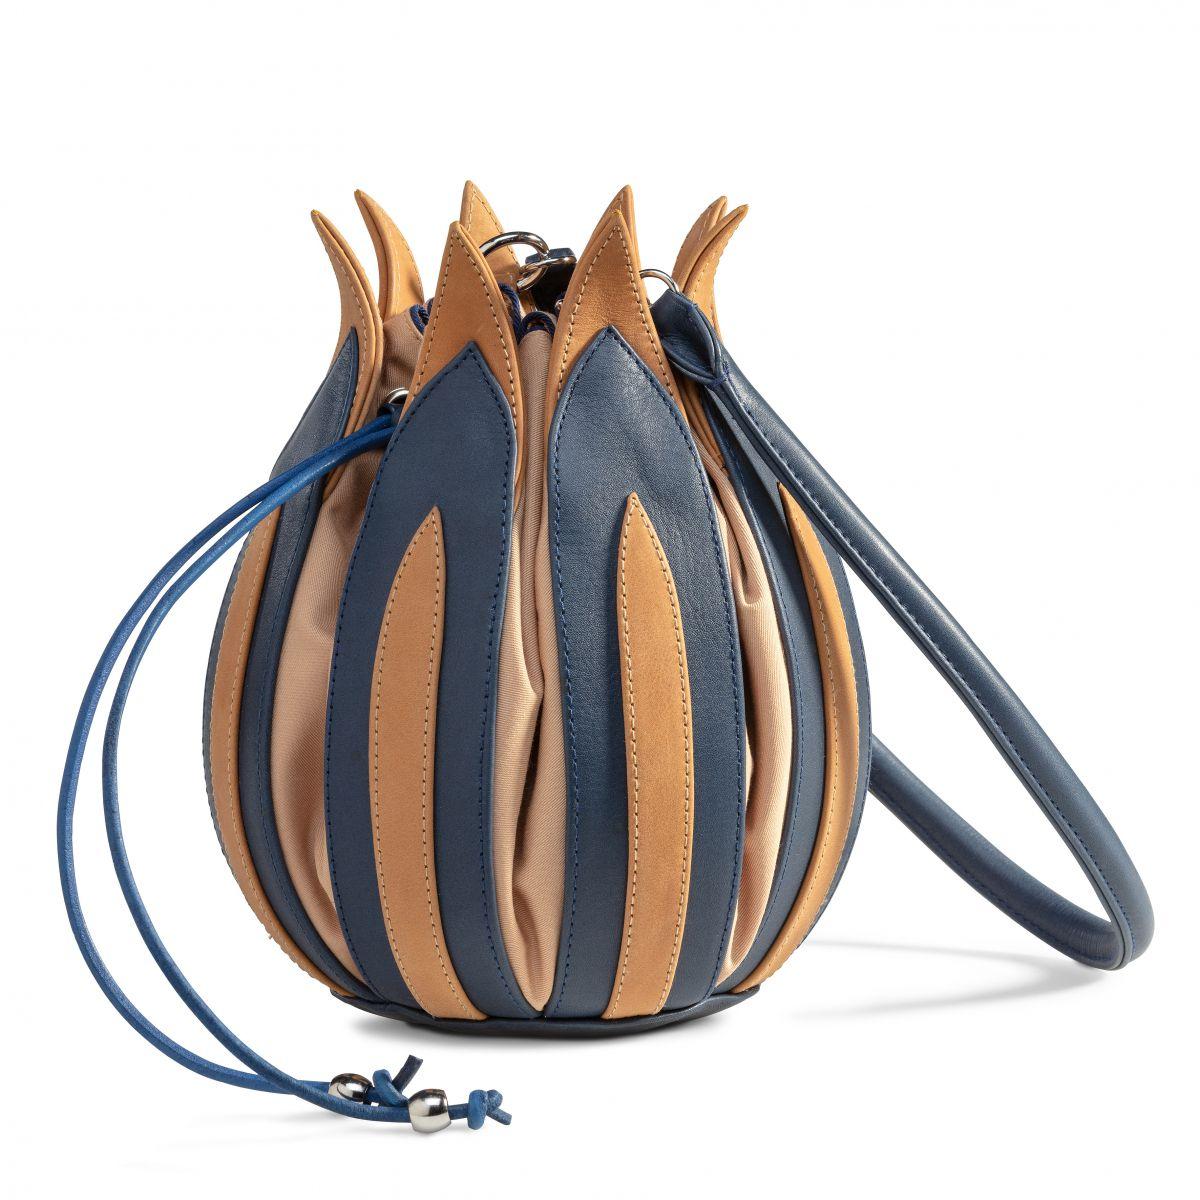 By Lin – Tulip Rembrandt Blue Cognac Camel